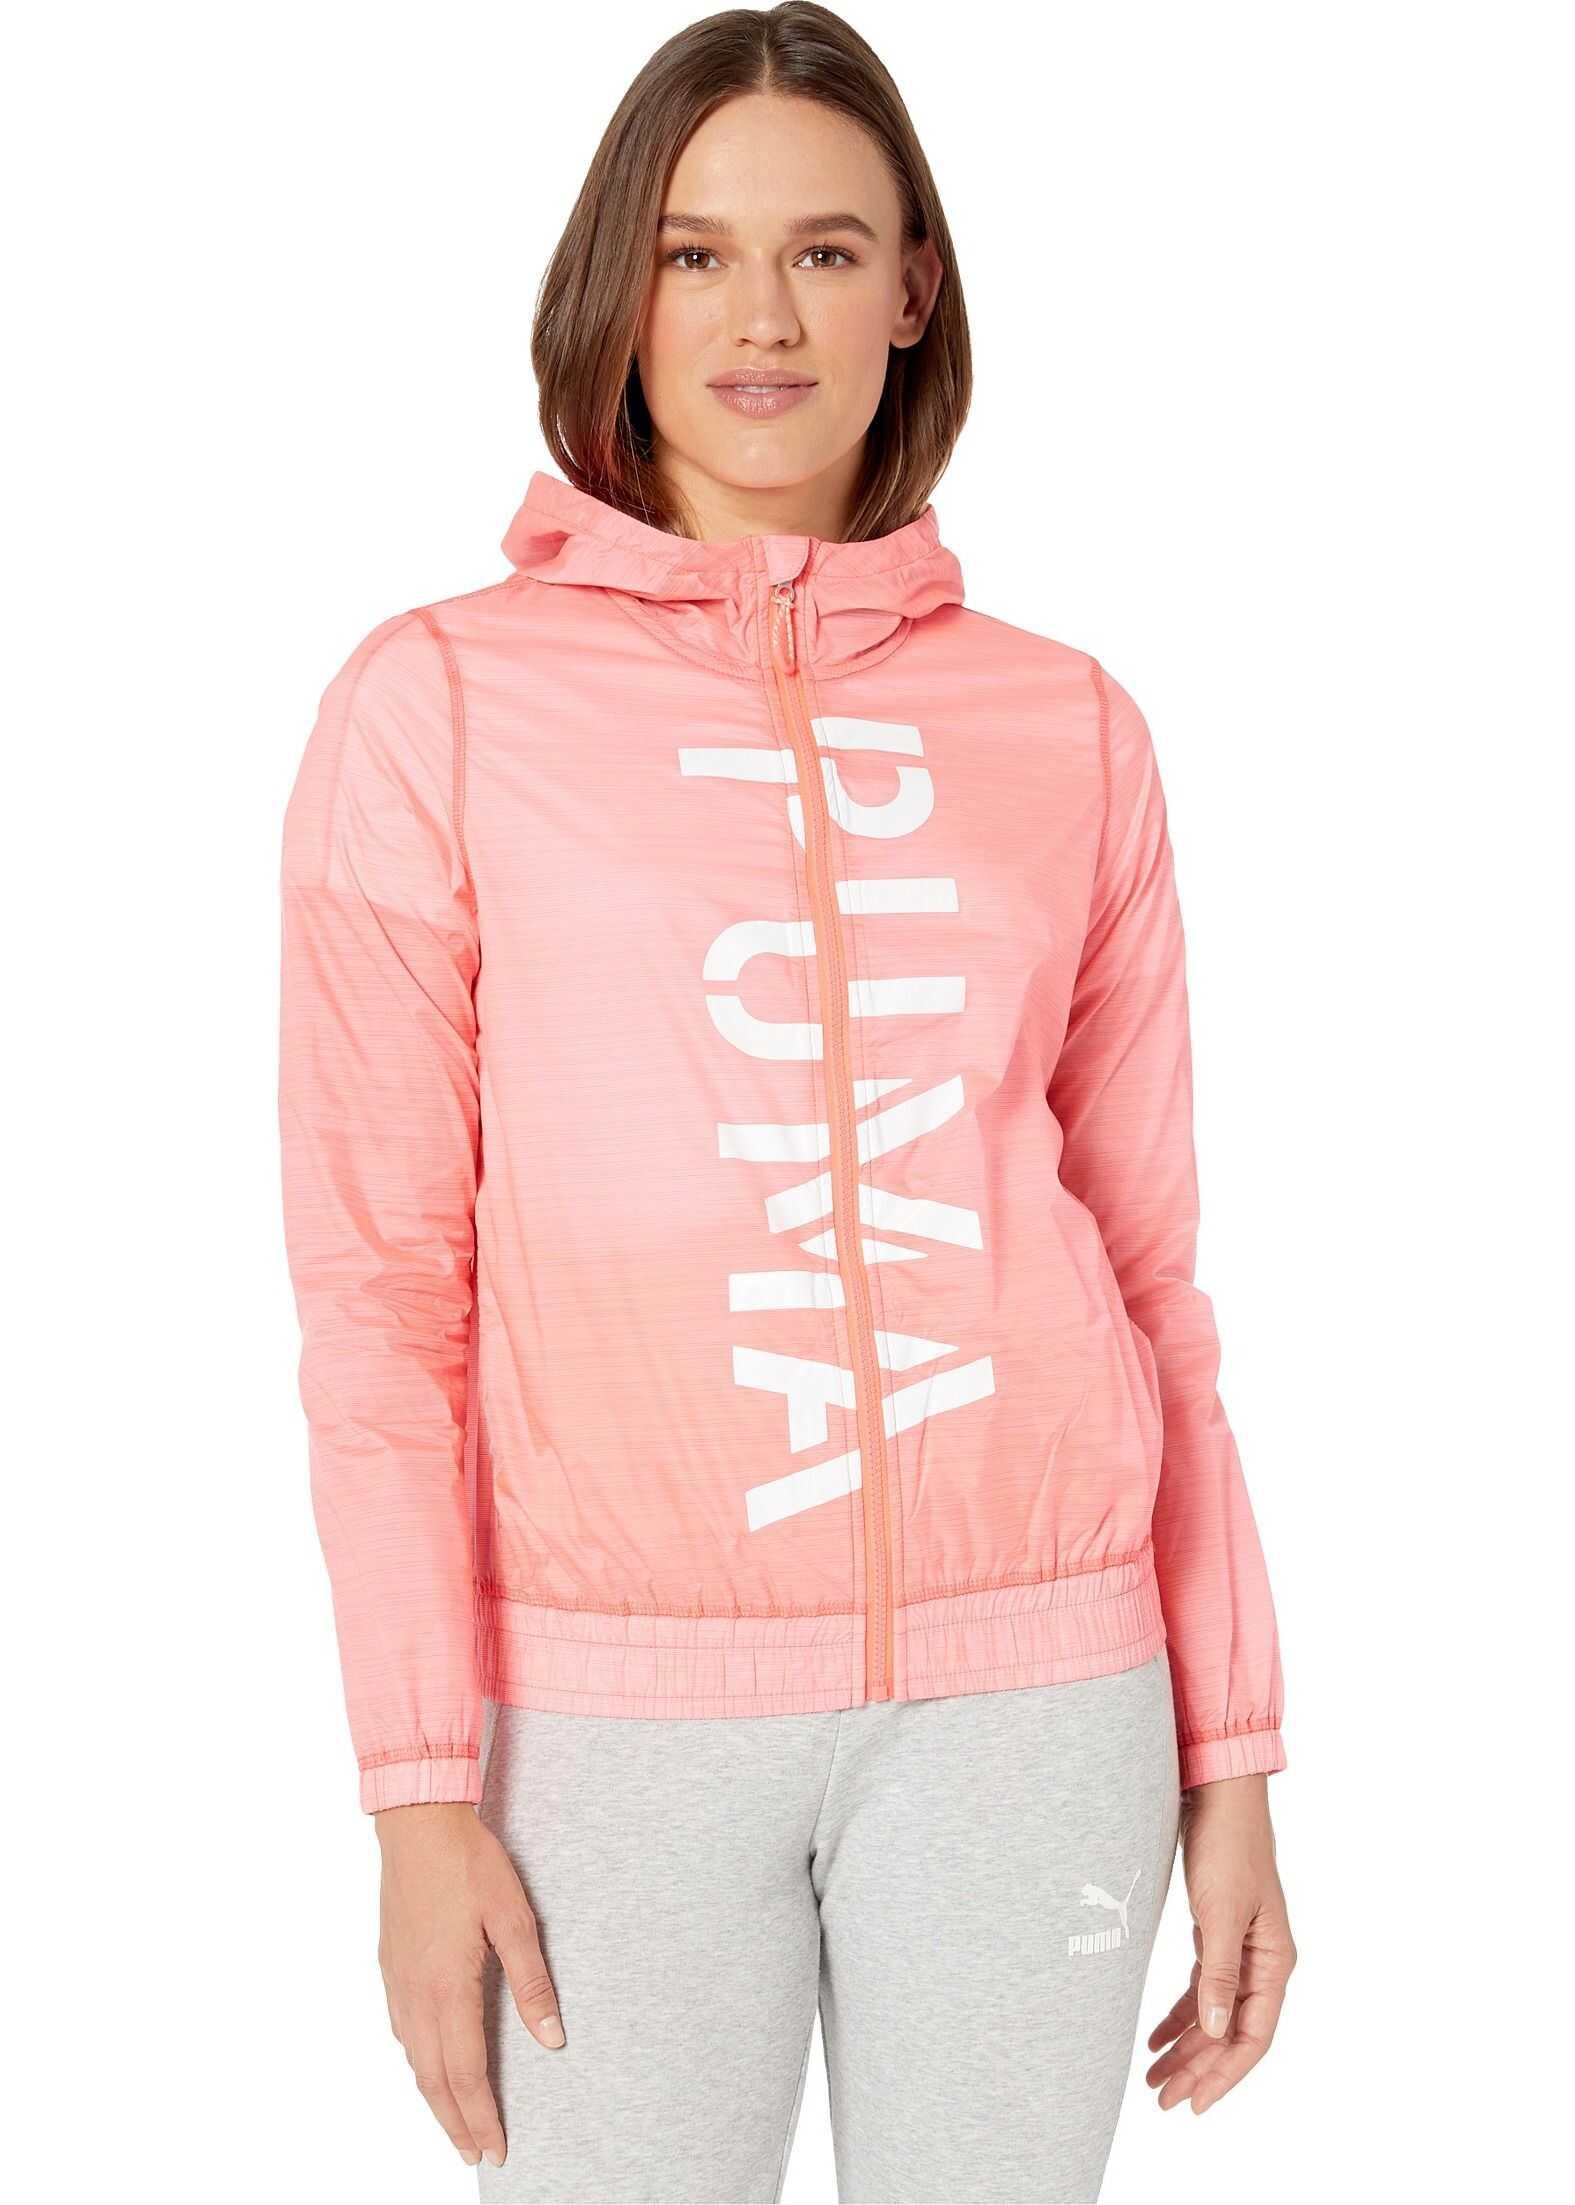 PUMA Be Bold Graphic Woven Jacket Pink Alert